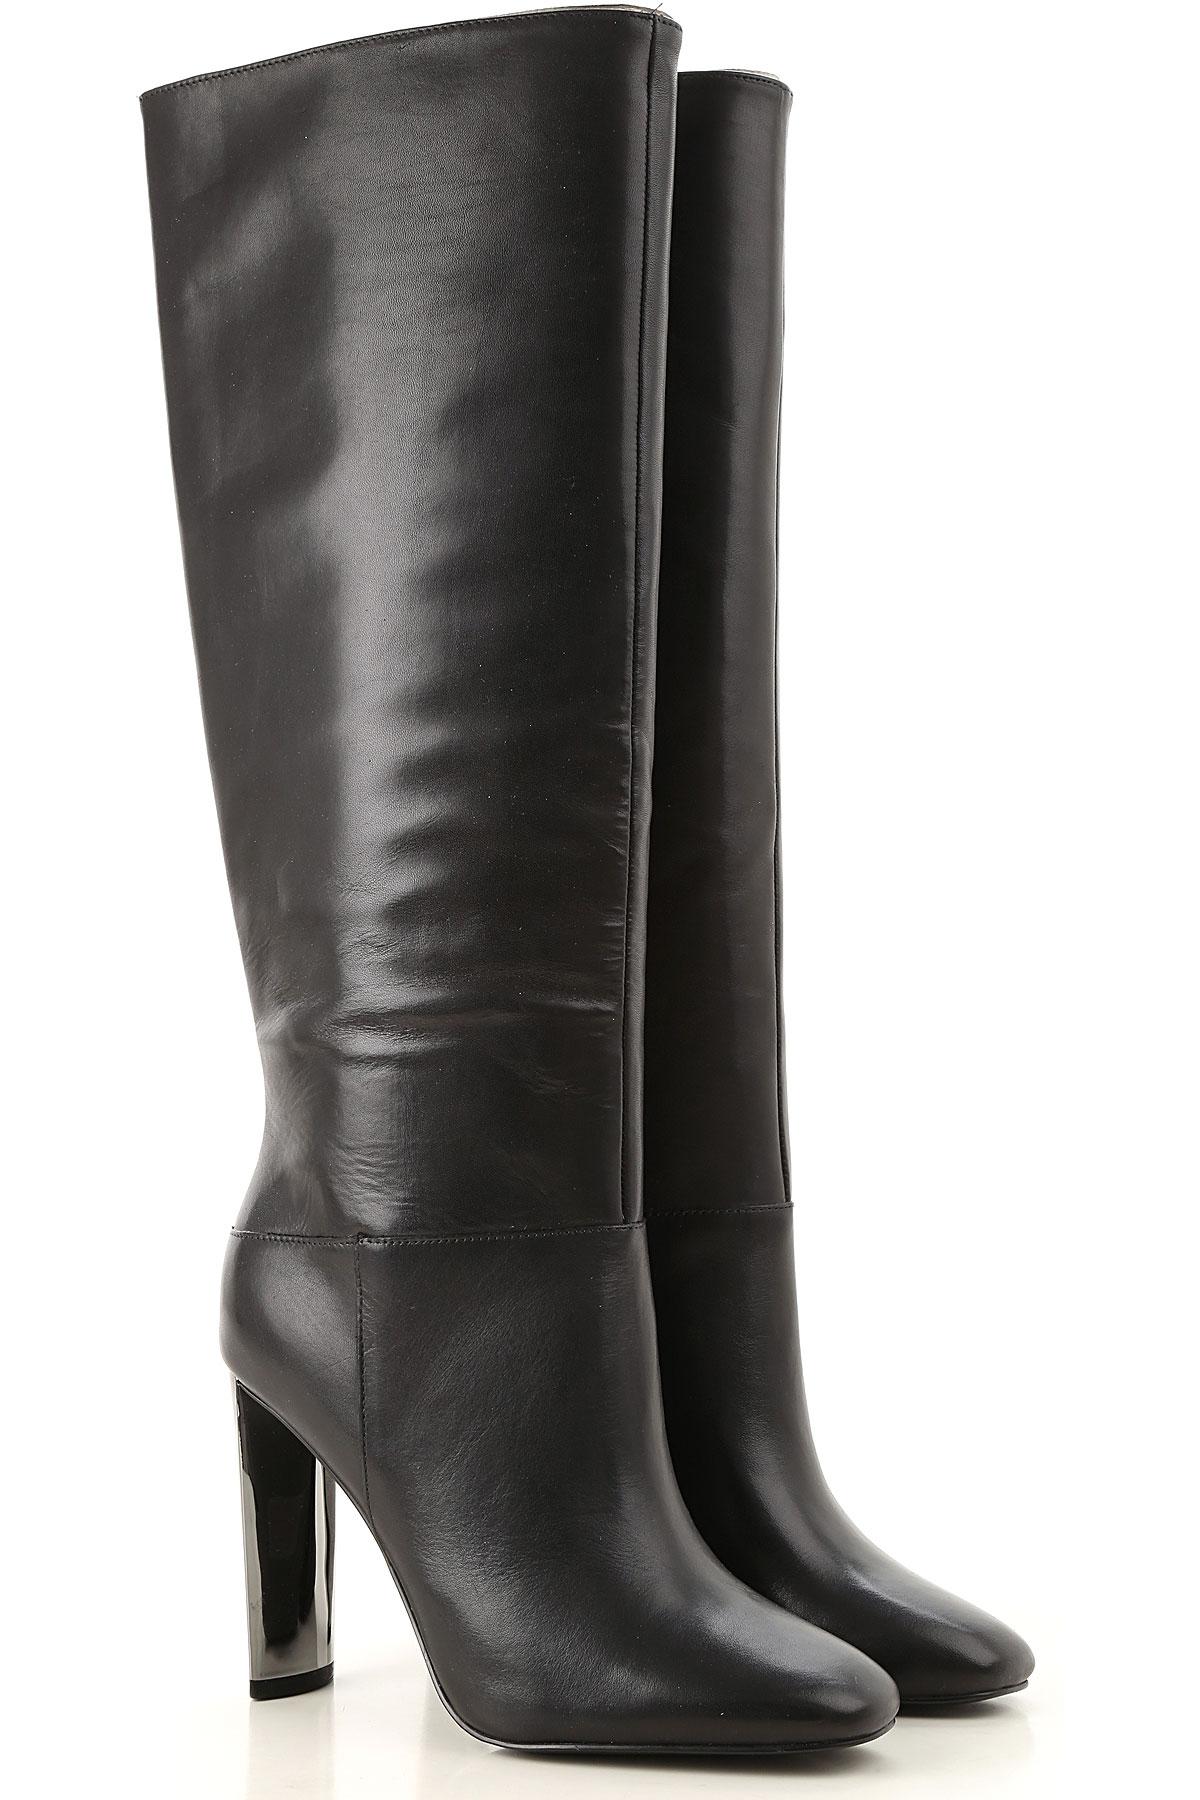 finest selection 1d011 30c55 32% Sale Guess Stiefel für Damen, Stiefeletten, Bootie ...